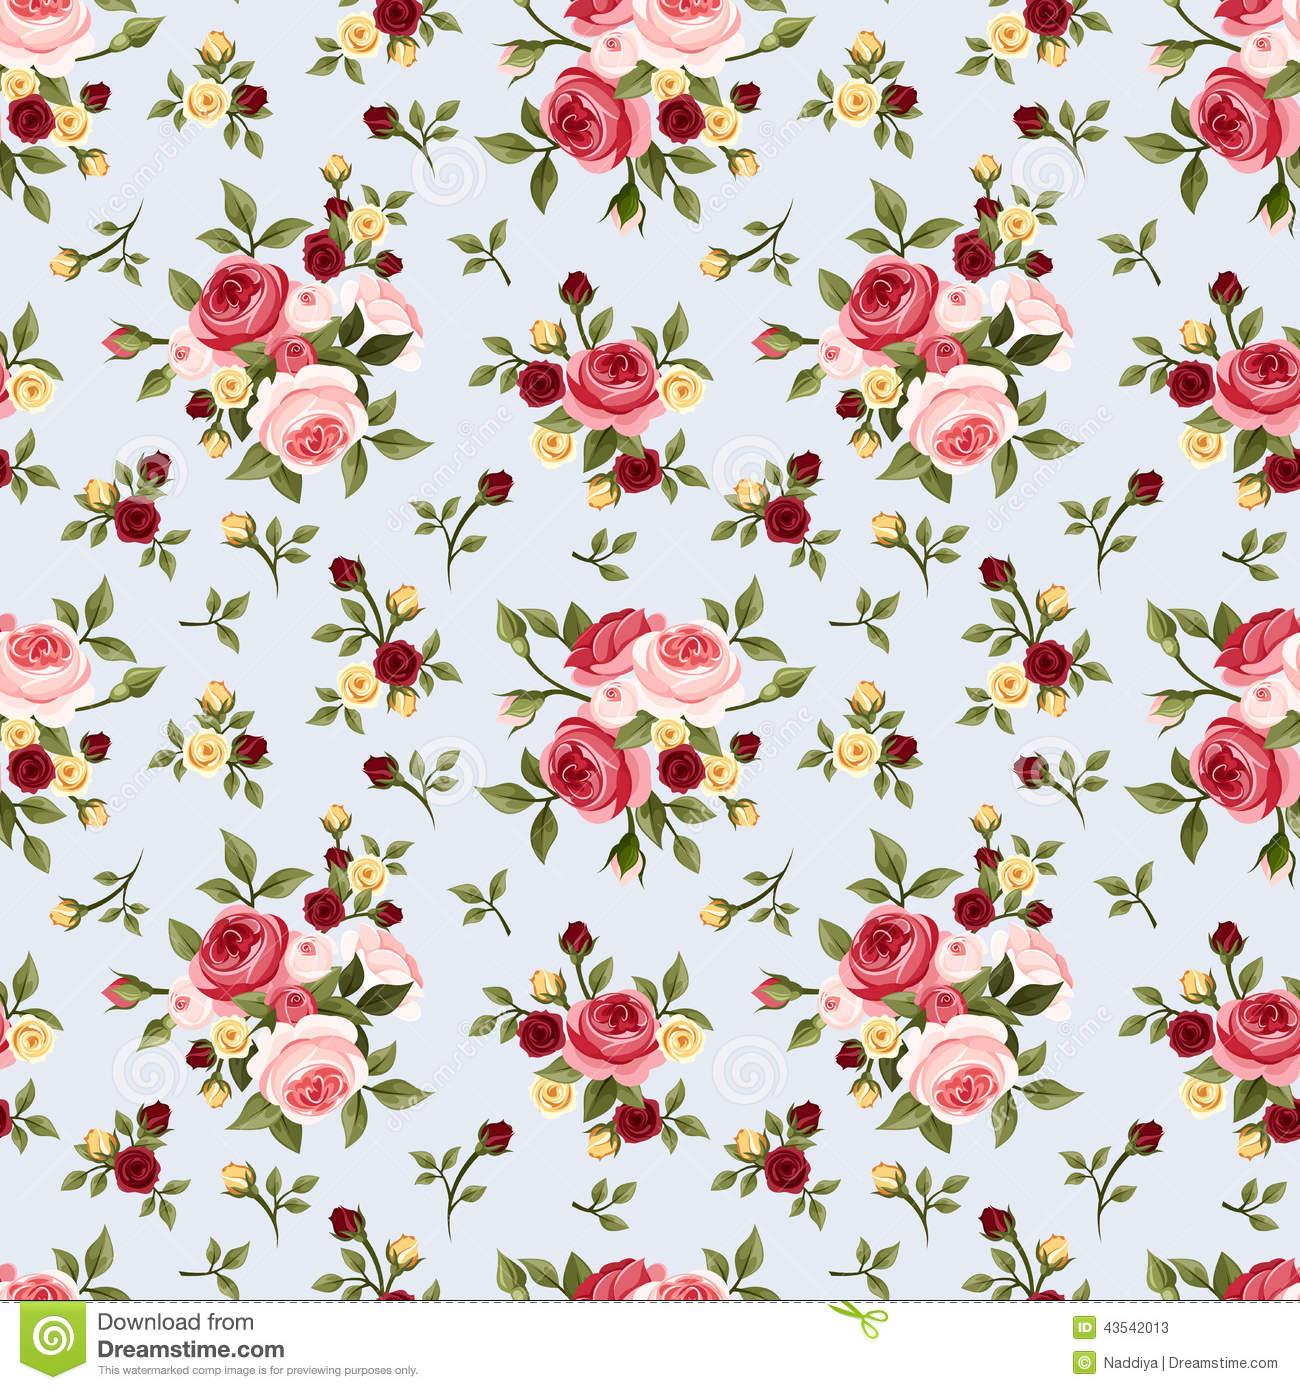 11 Vector Vintage Roses Images - Vintage Rose Vector Free ...